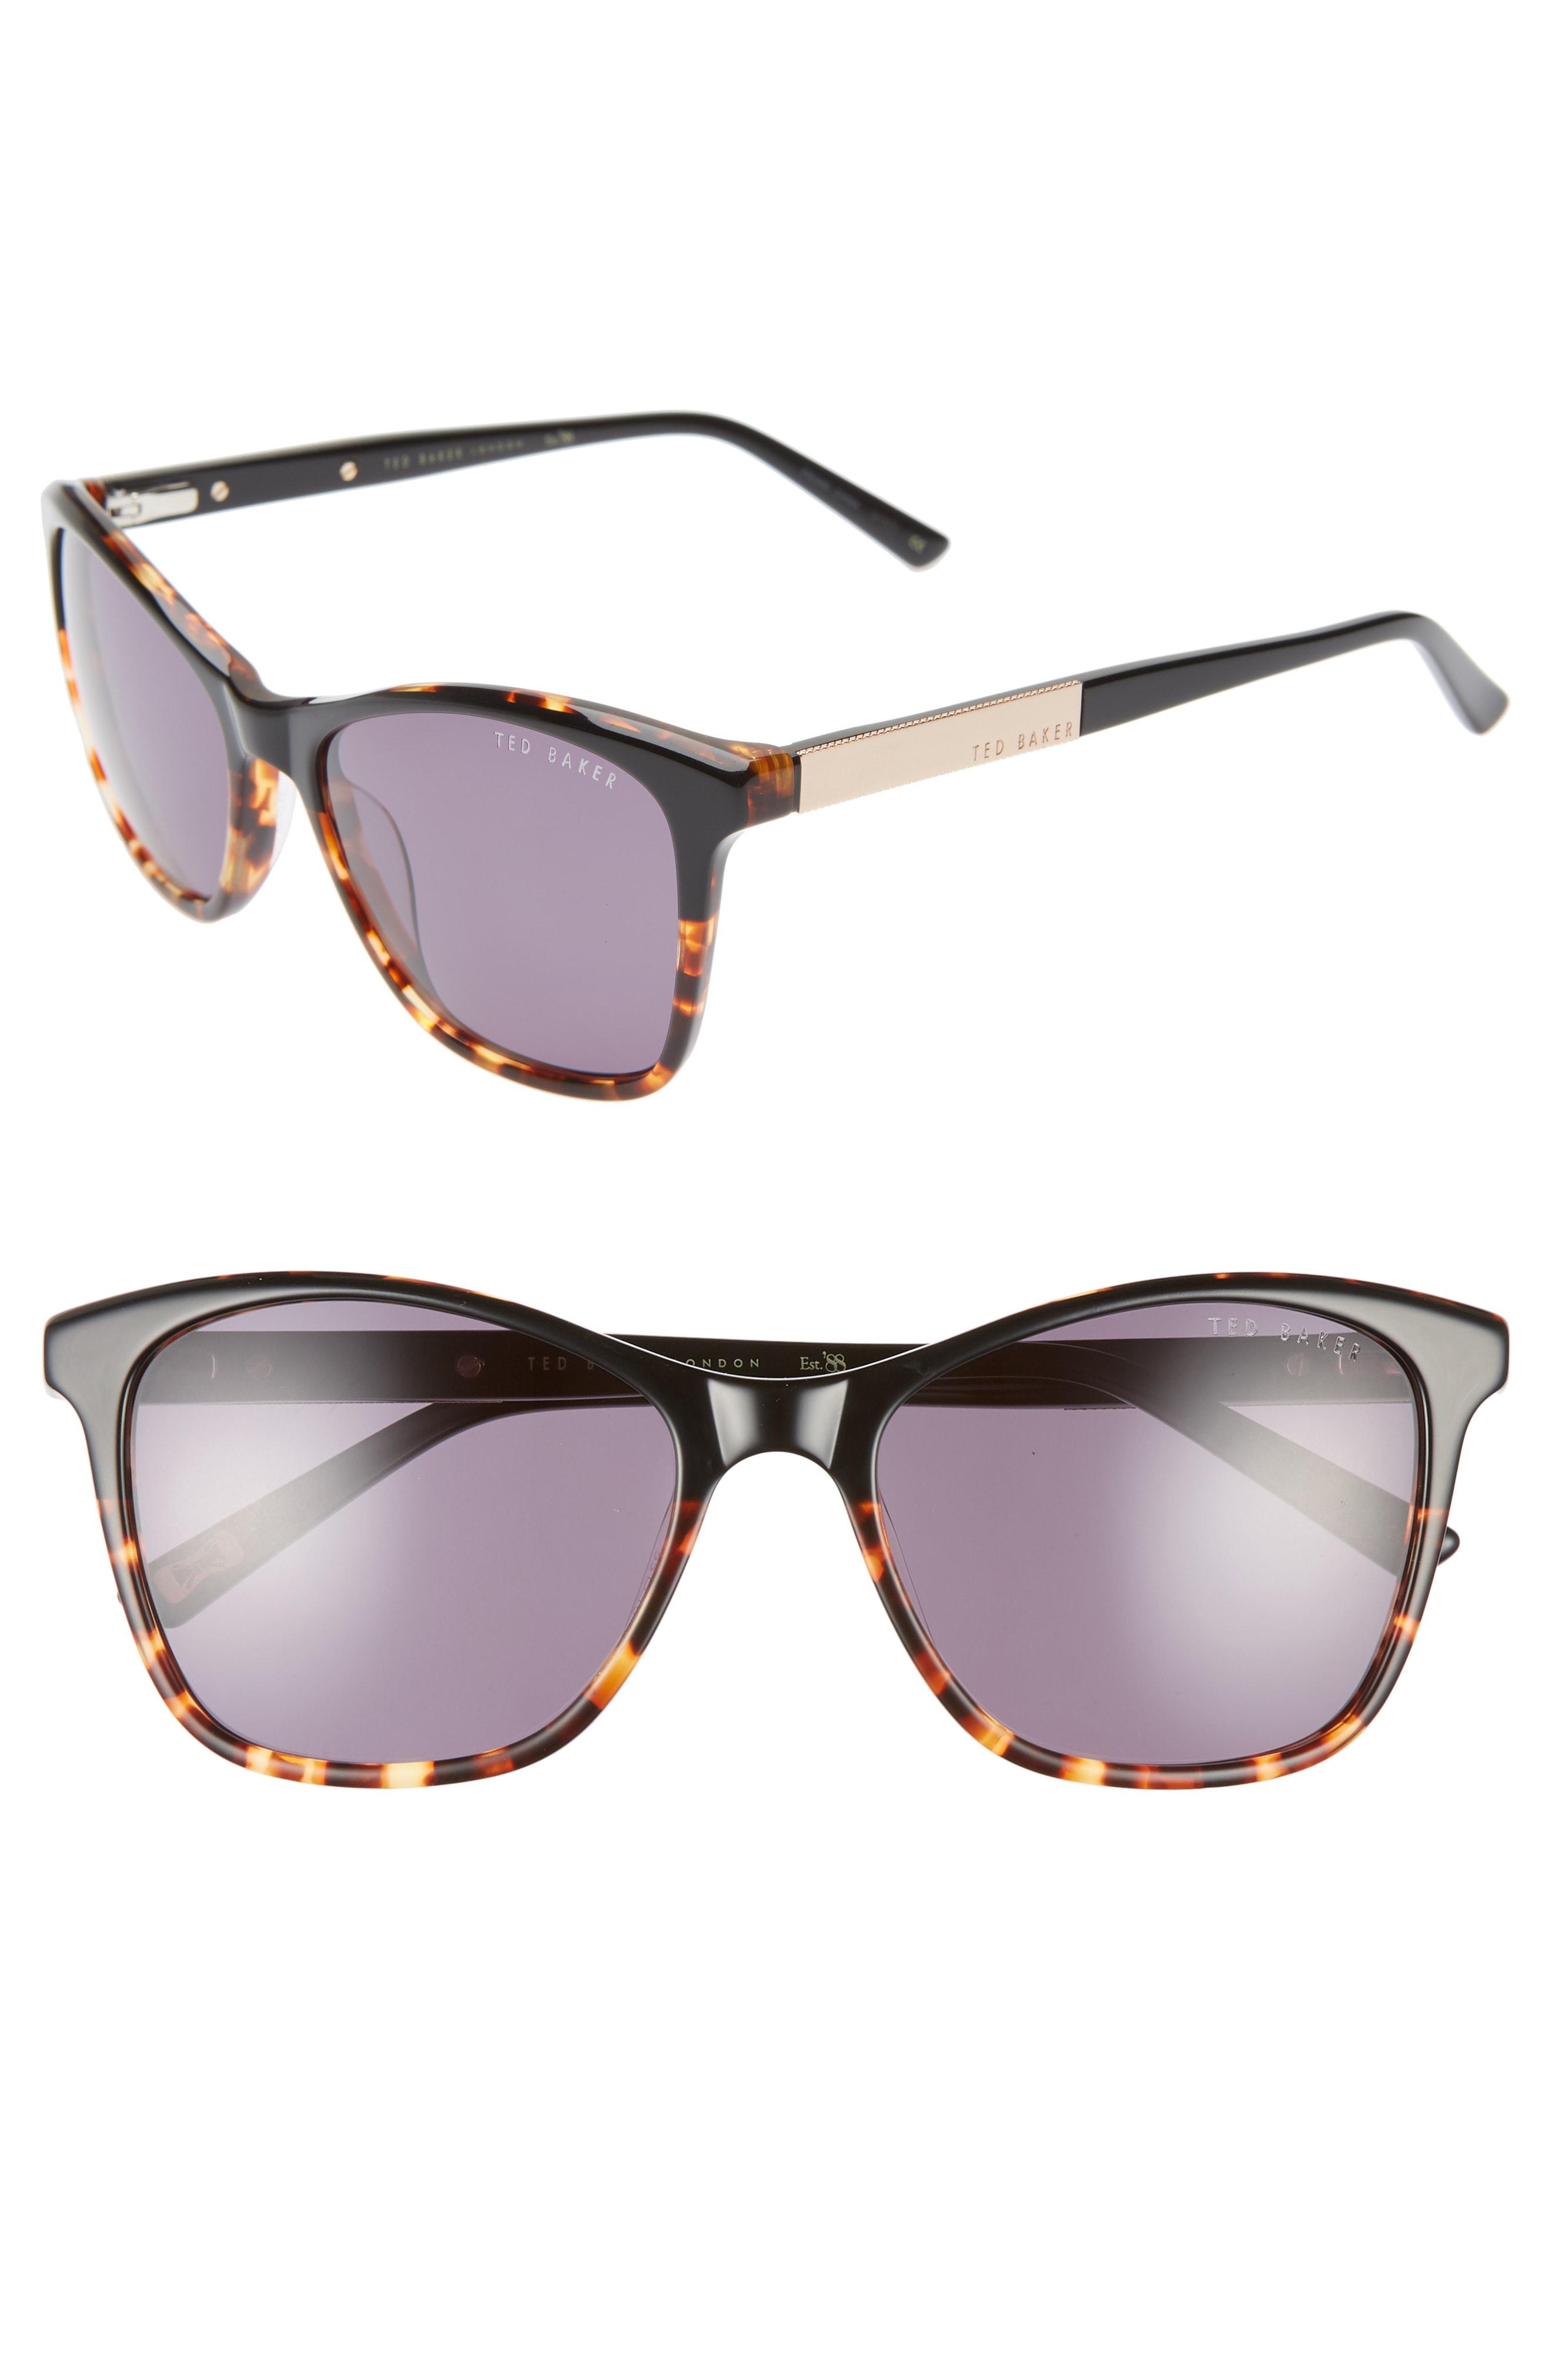 5014d52b86064 Ted Baker 55Mm Square Cat Eye Sunglasses - Black Havana  Gold  Purple